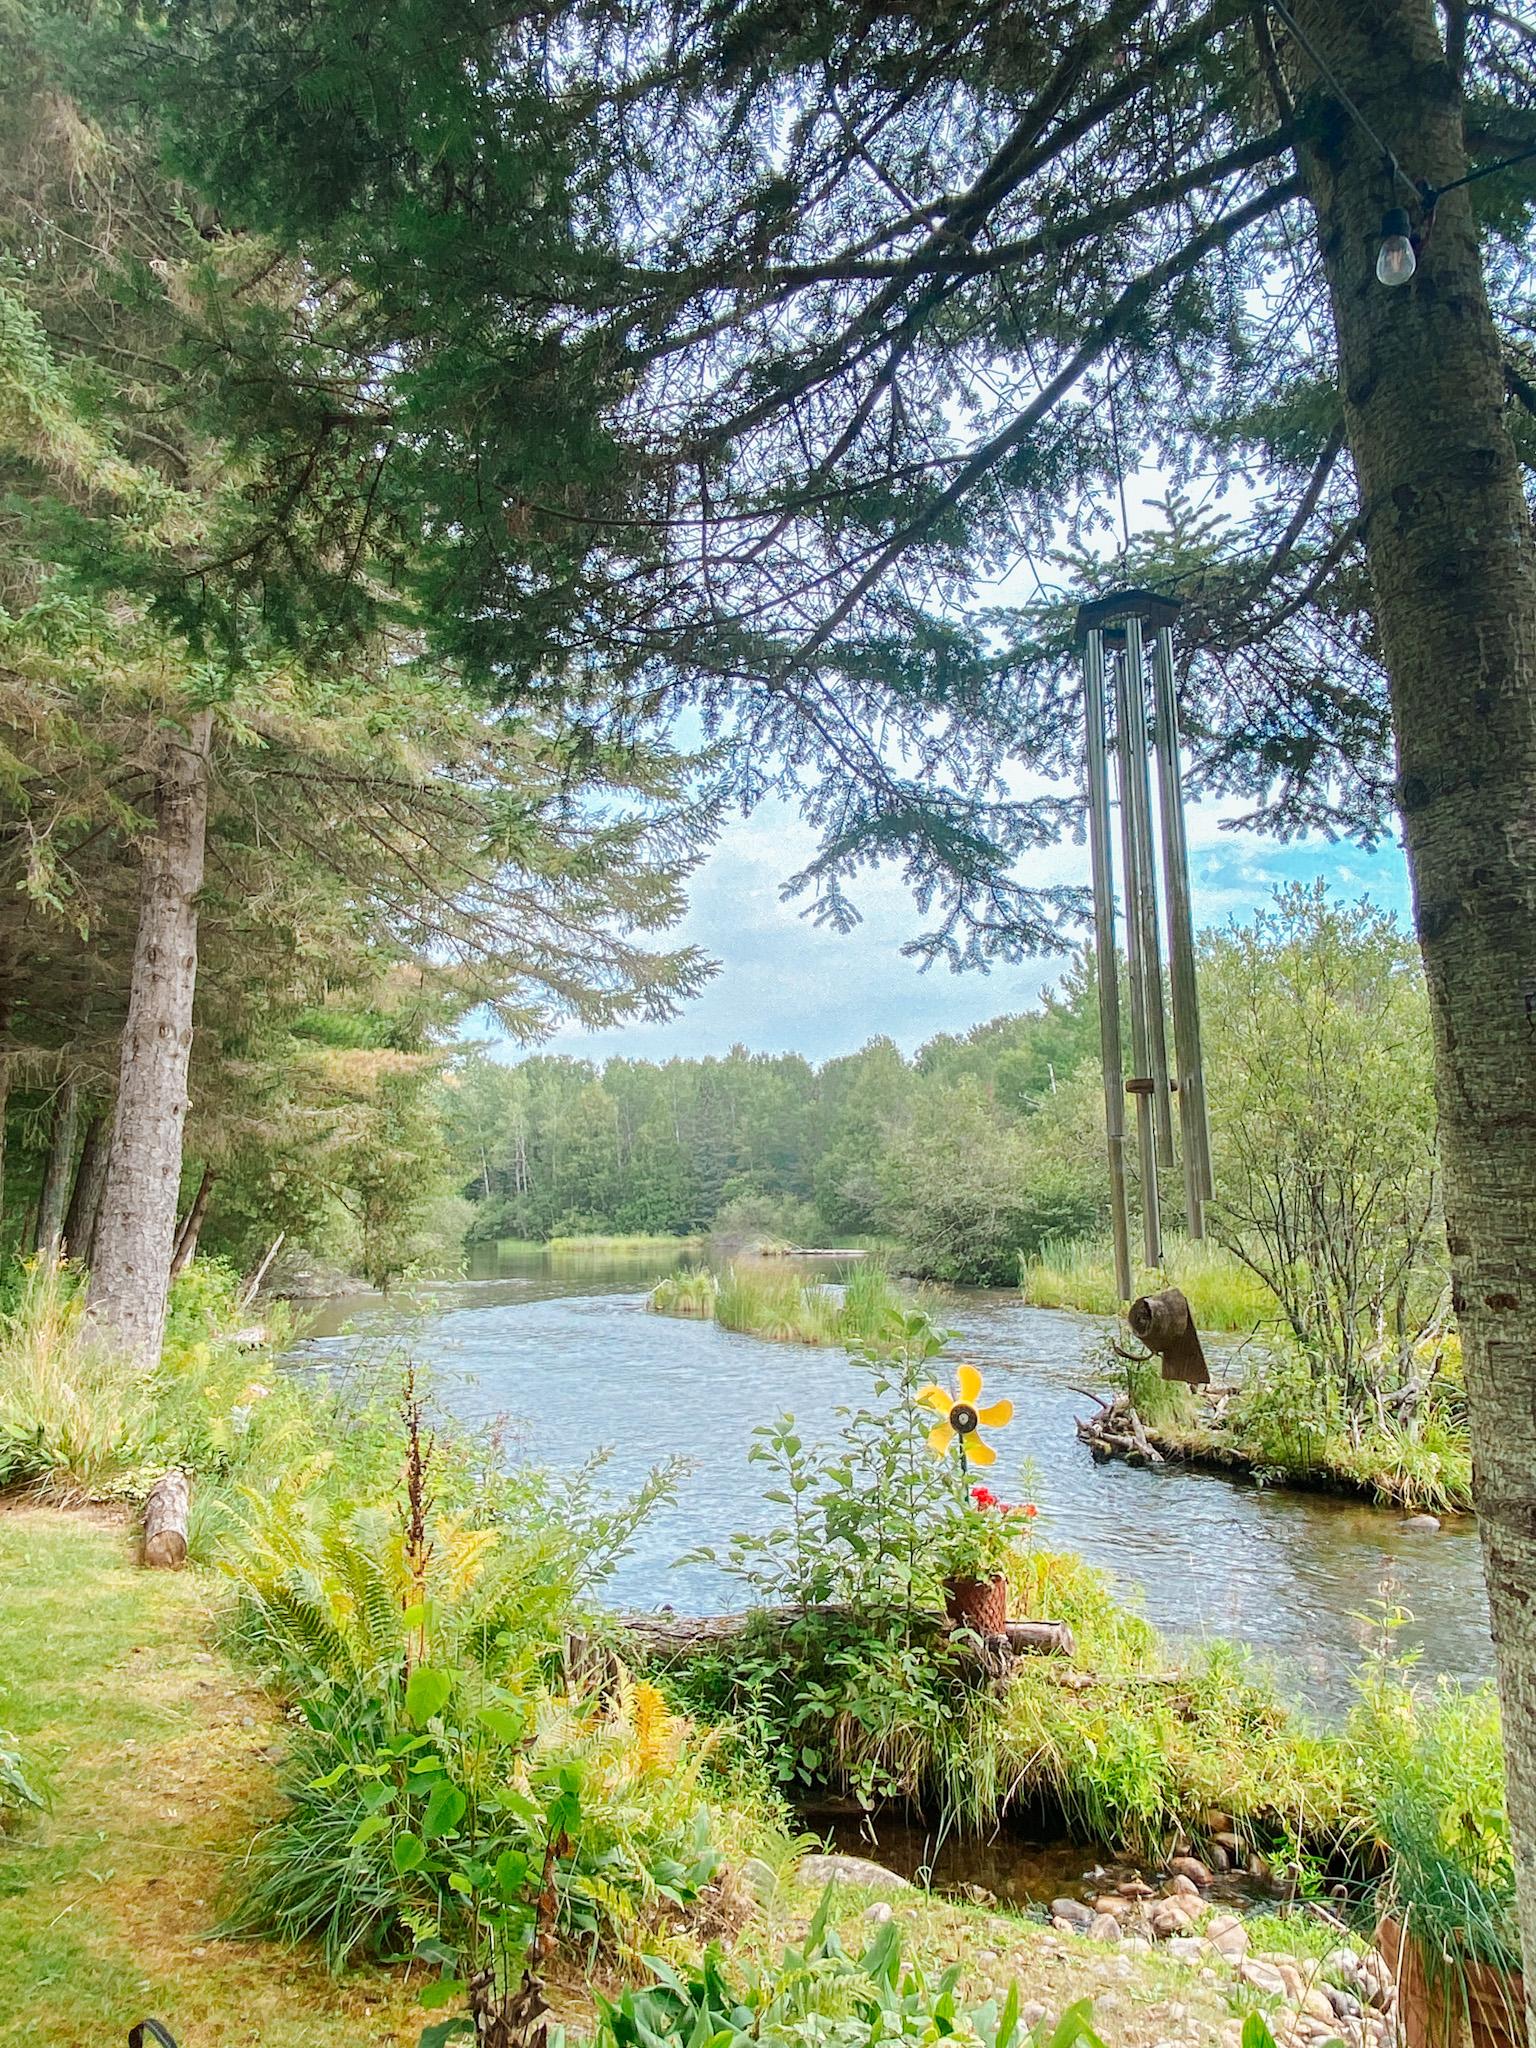 Lovell's cottage on river